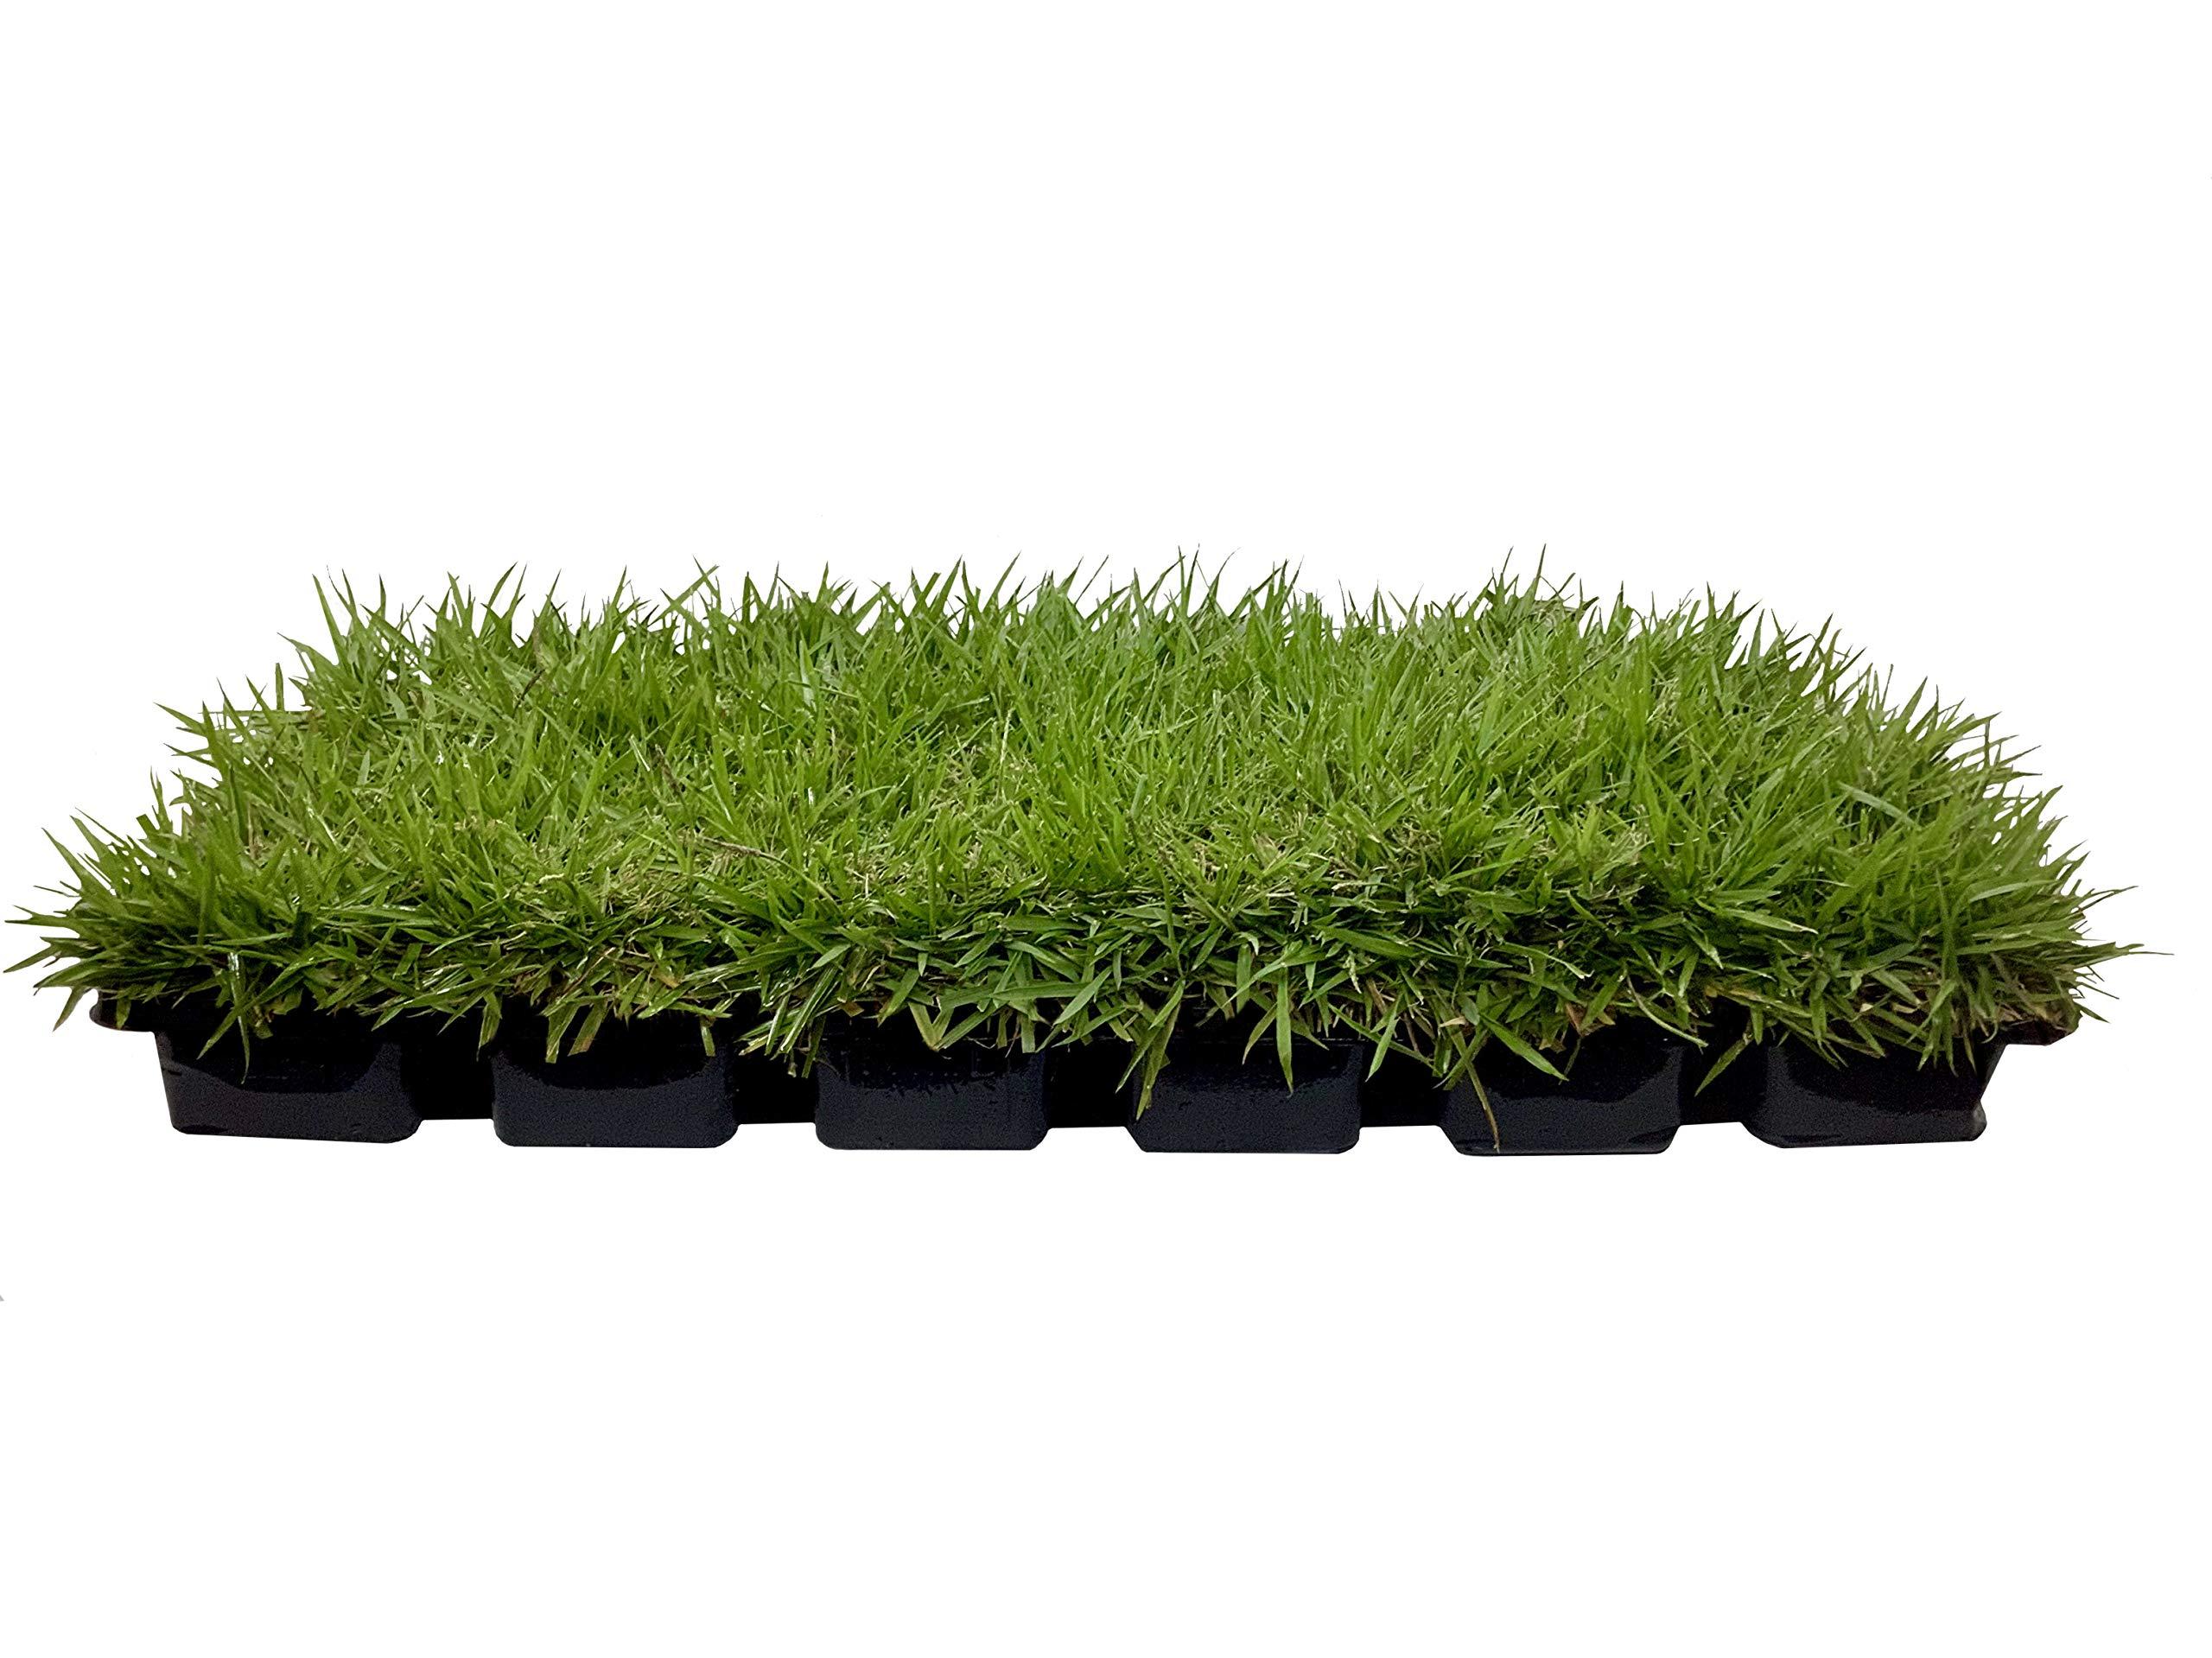 Zoysia Sod Plugs - Large 3'' x 3'' Plugs - 18 Count Tray - Drought, Salt & Shade Tolerant Turf Grass